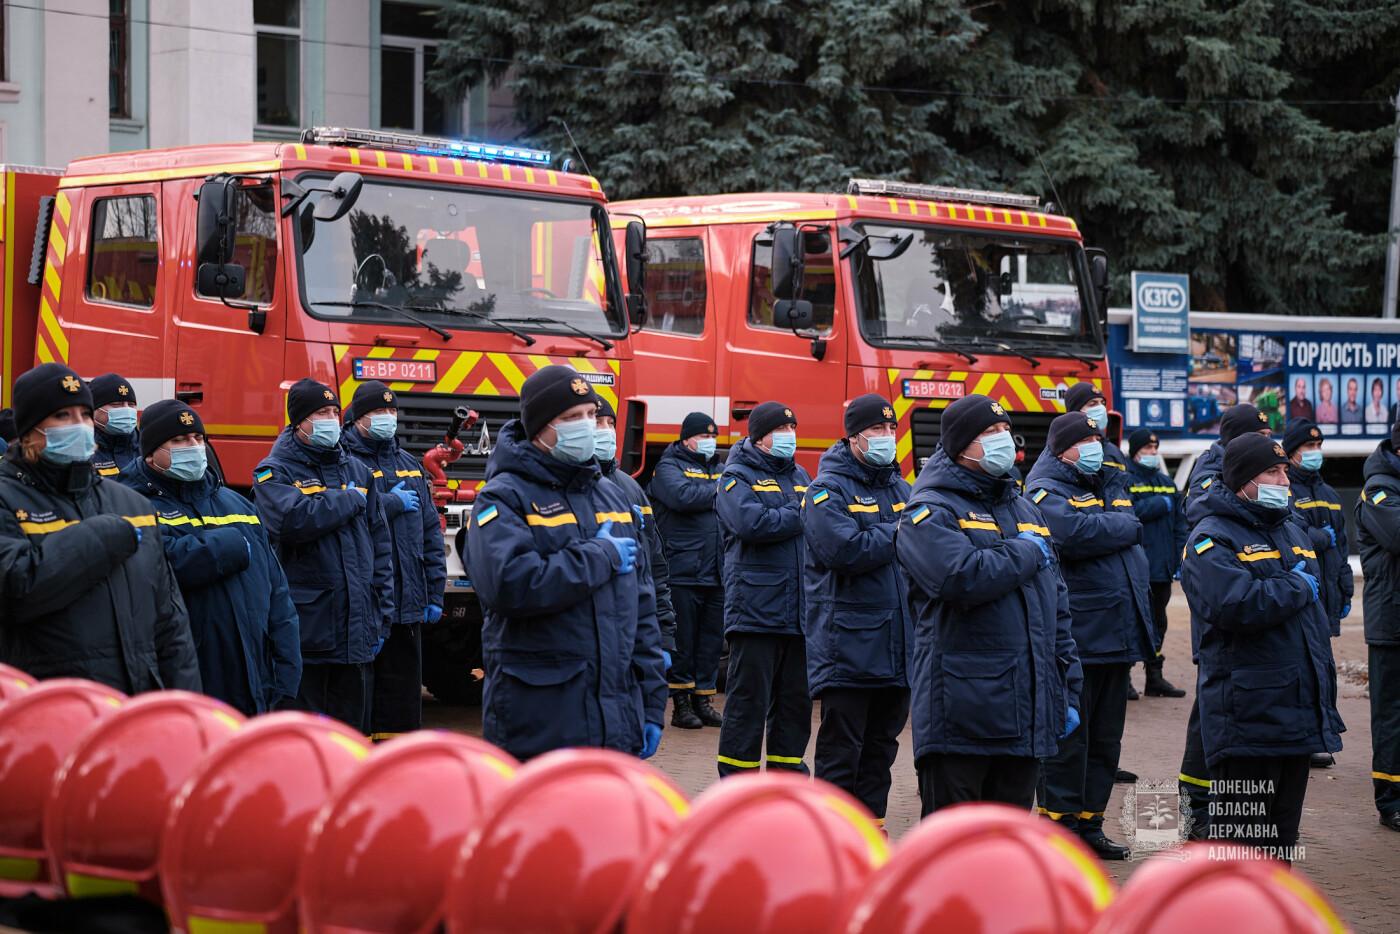 Слов'янські рятувальники отримали нову пожежну автоцистерну, фото-19